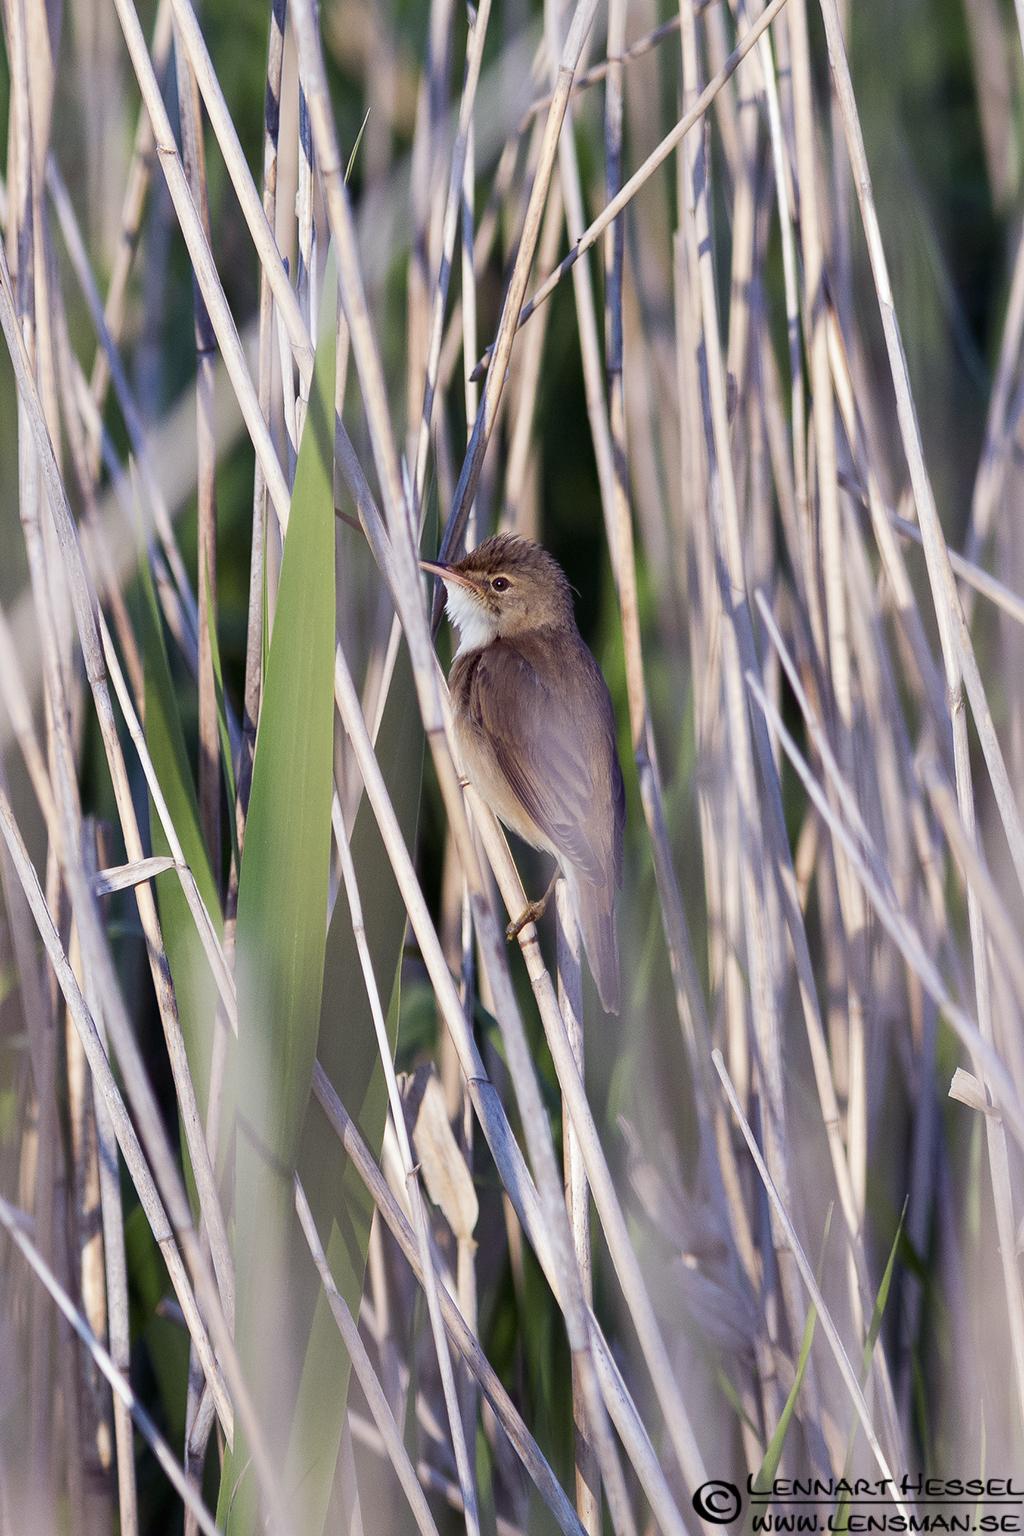 Eurasian Reed Warbler at Säveån, warblers